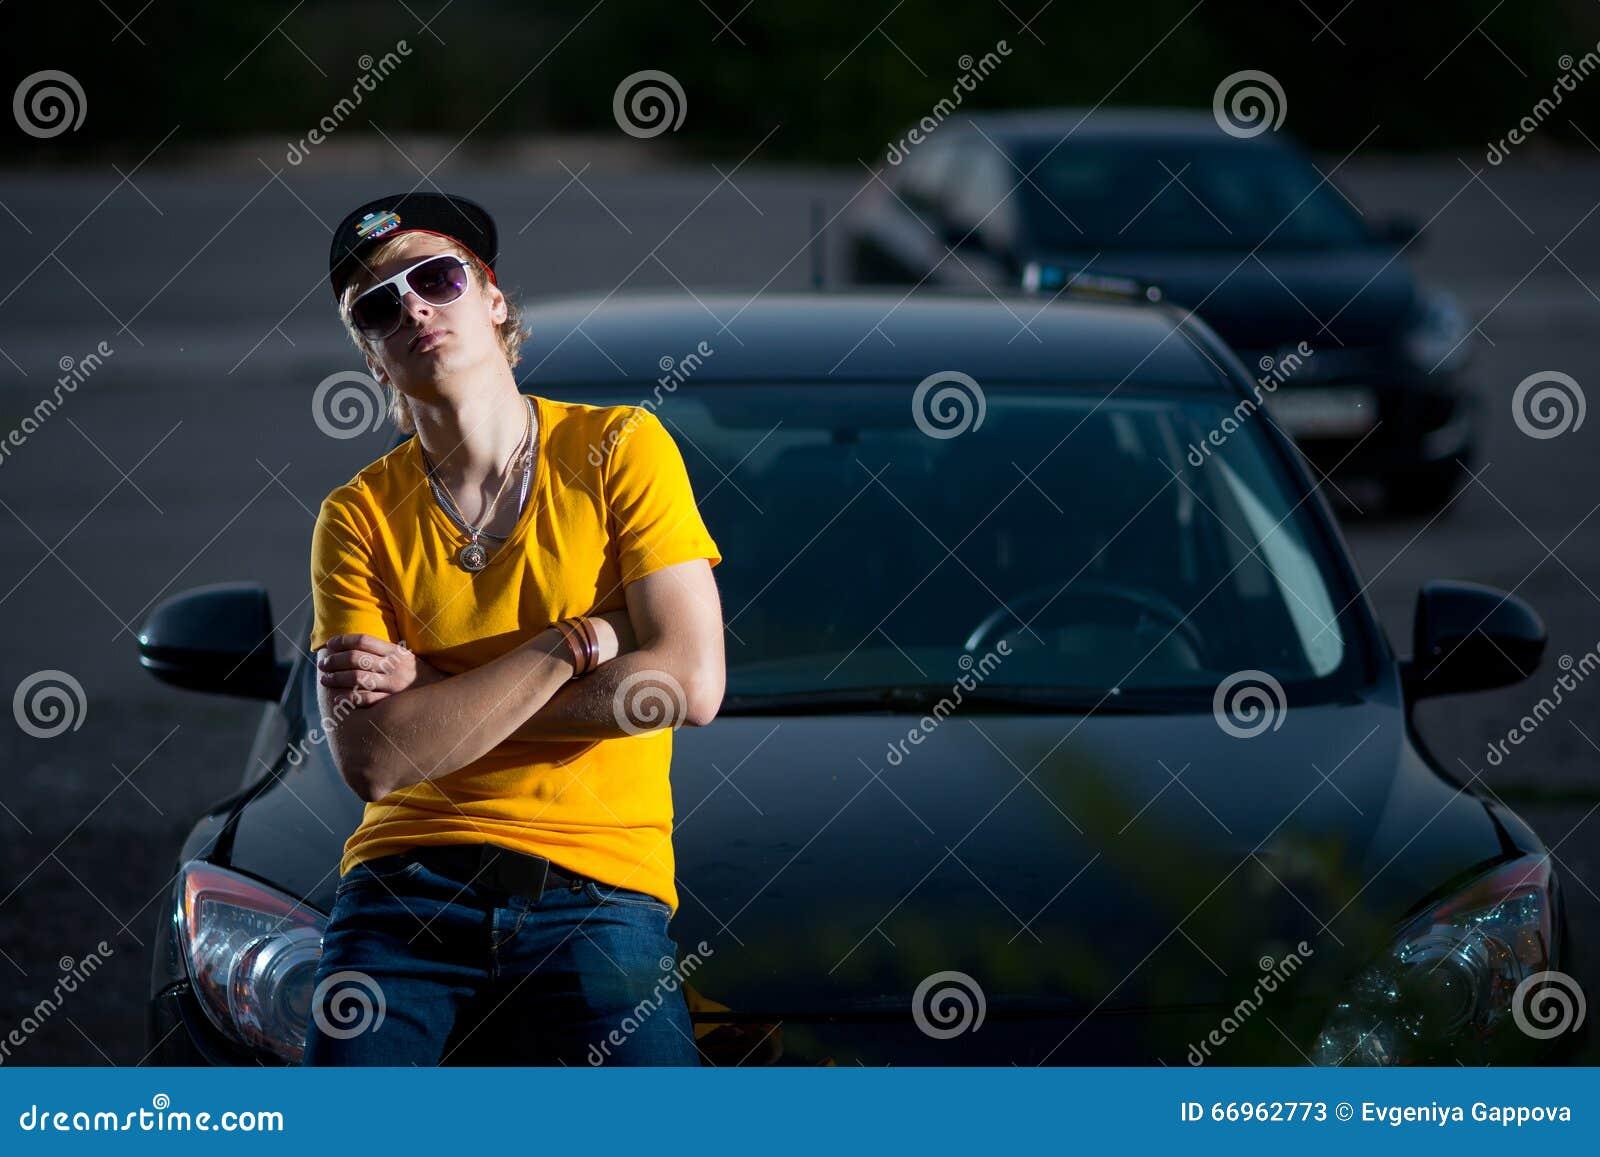 Superbe A Rich Guy In A Car, Cool Dude